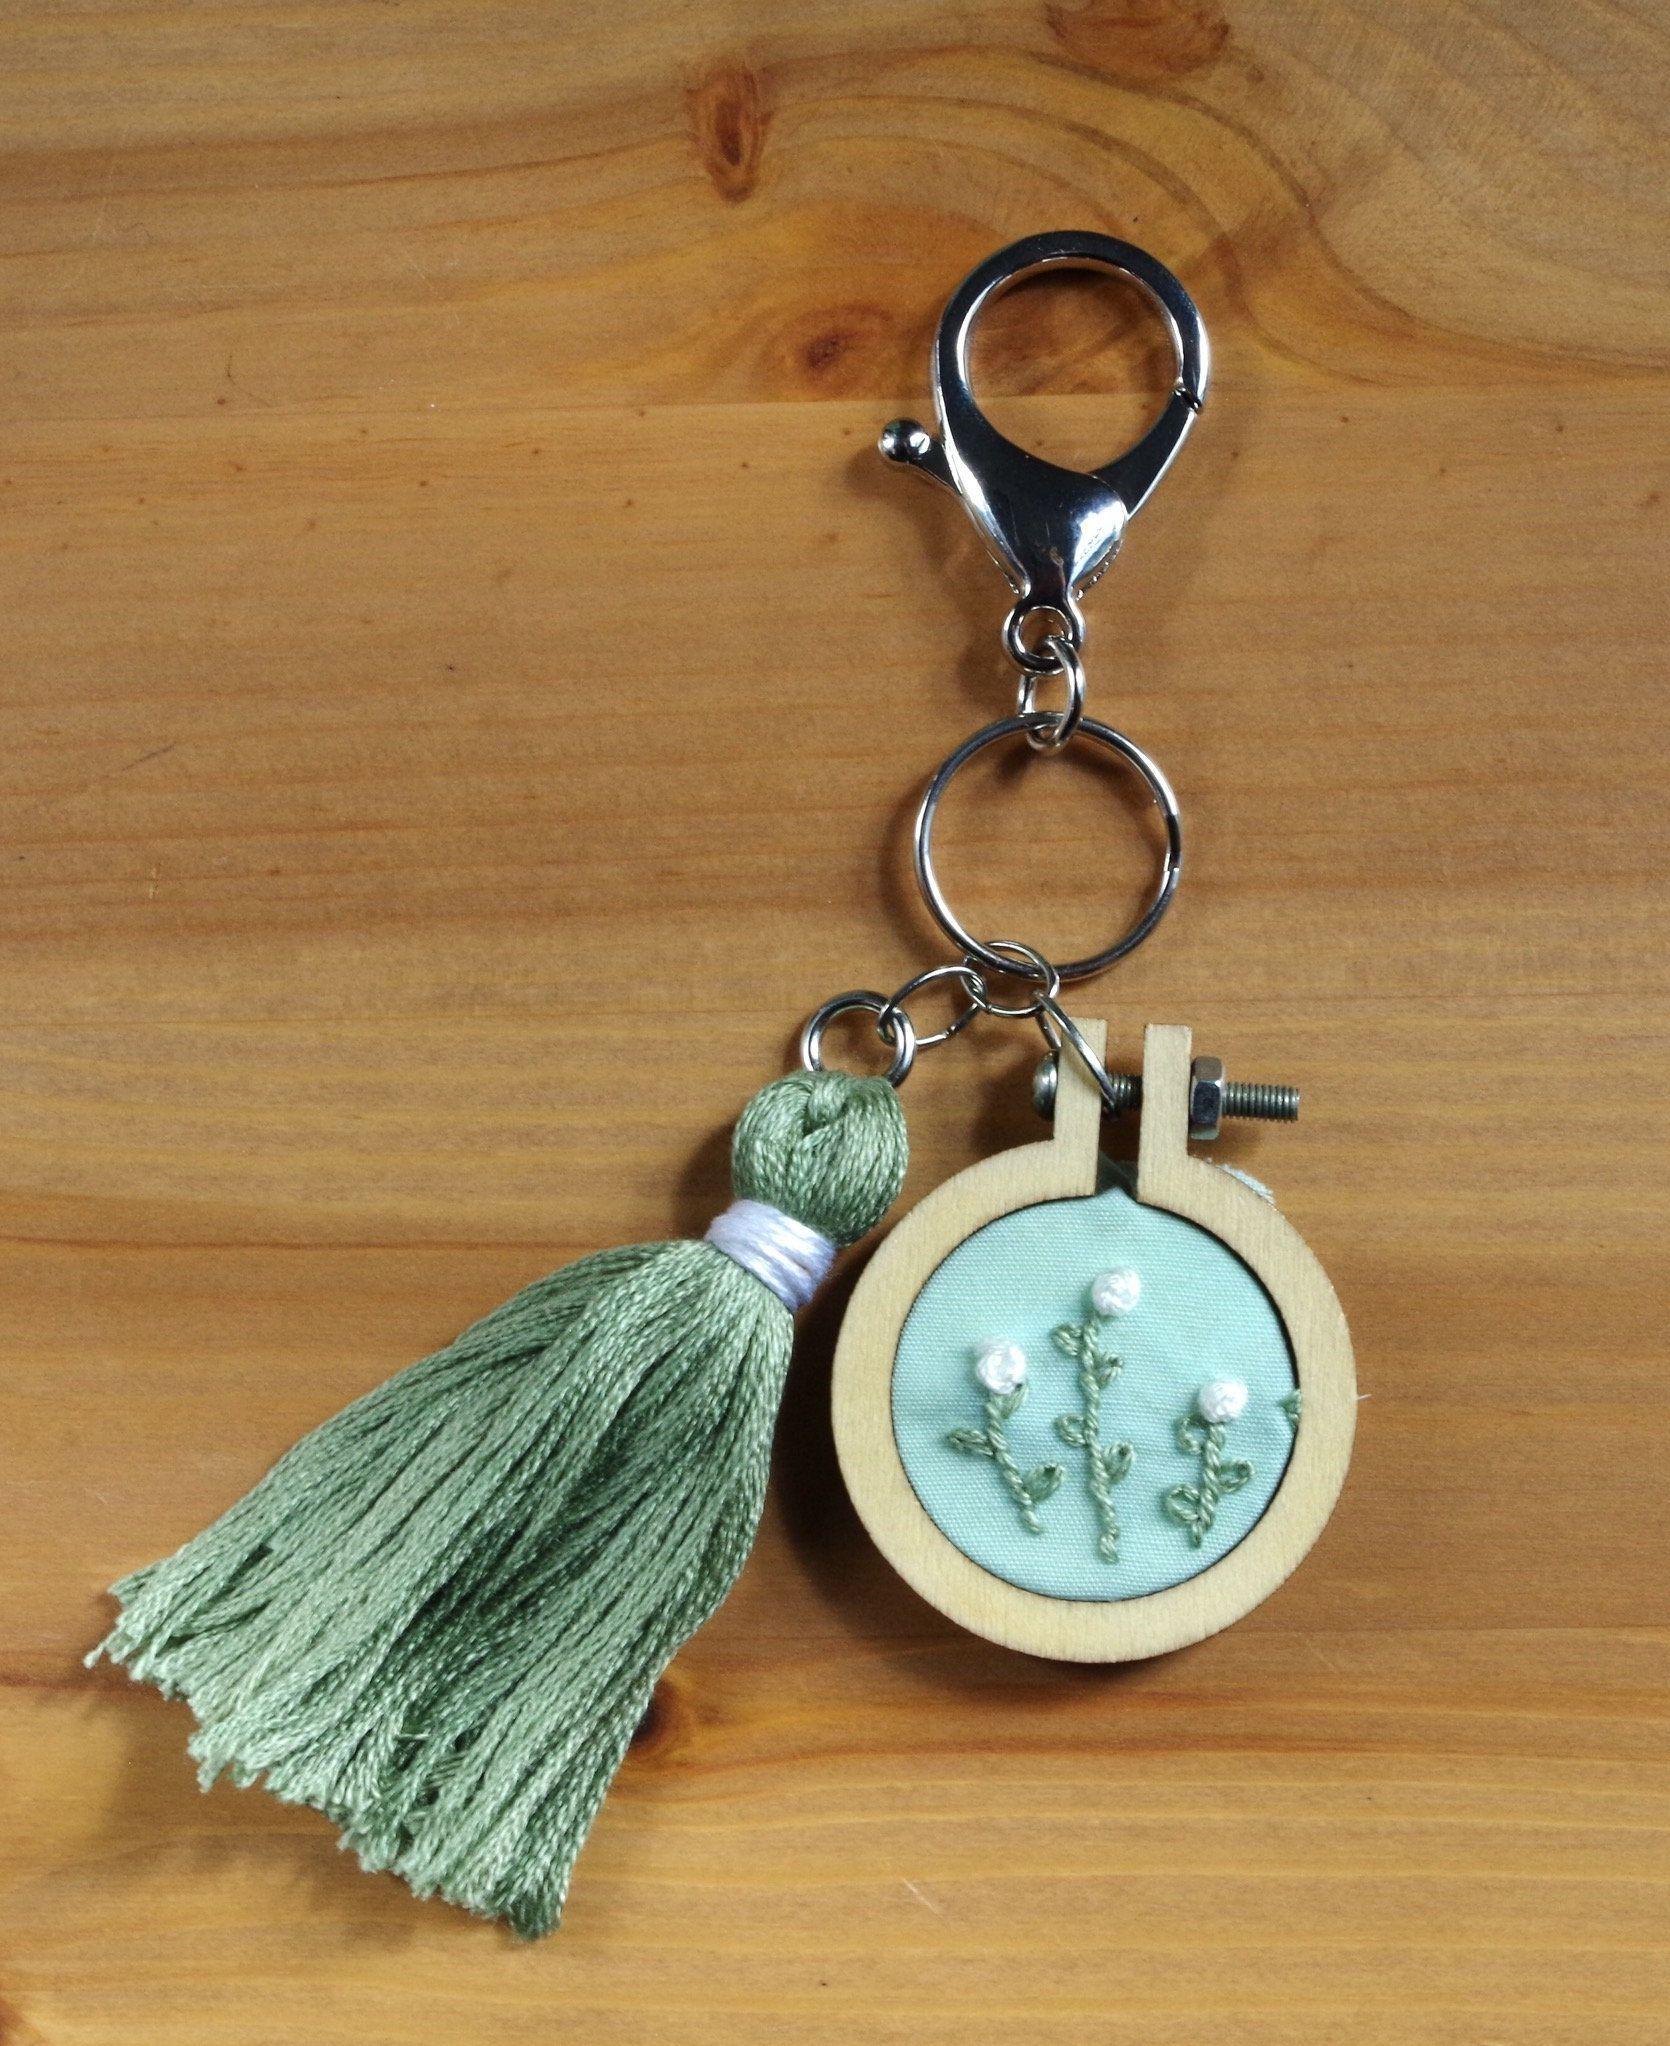 Embroidered keychain - bag embellishment, zipper charm